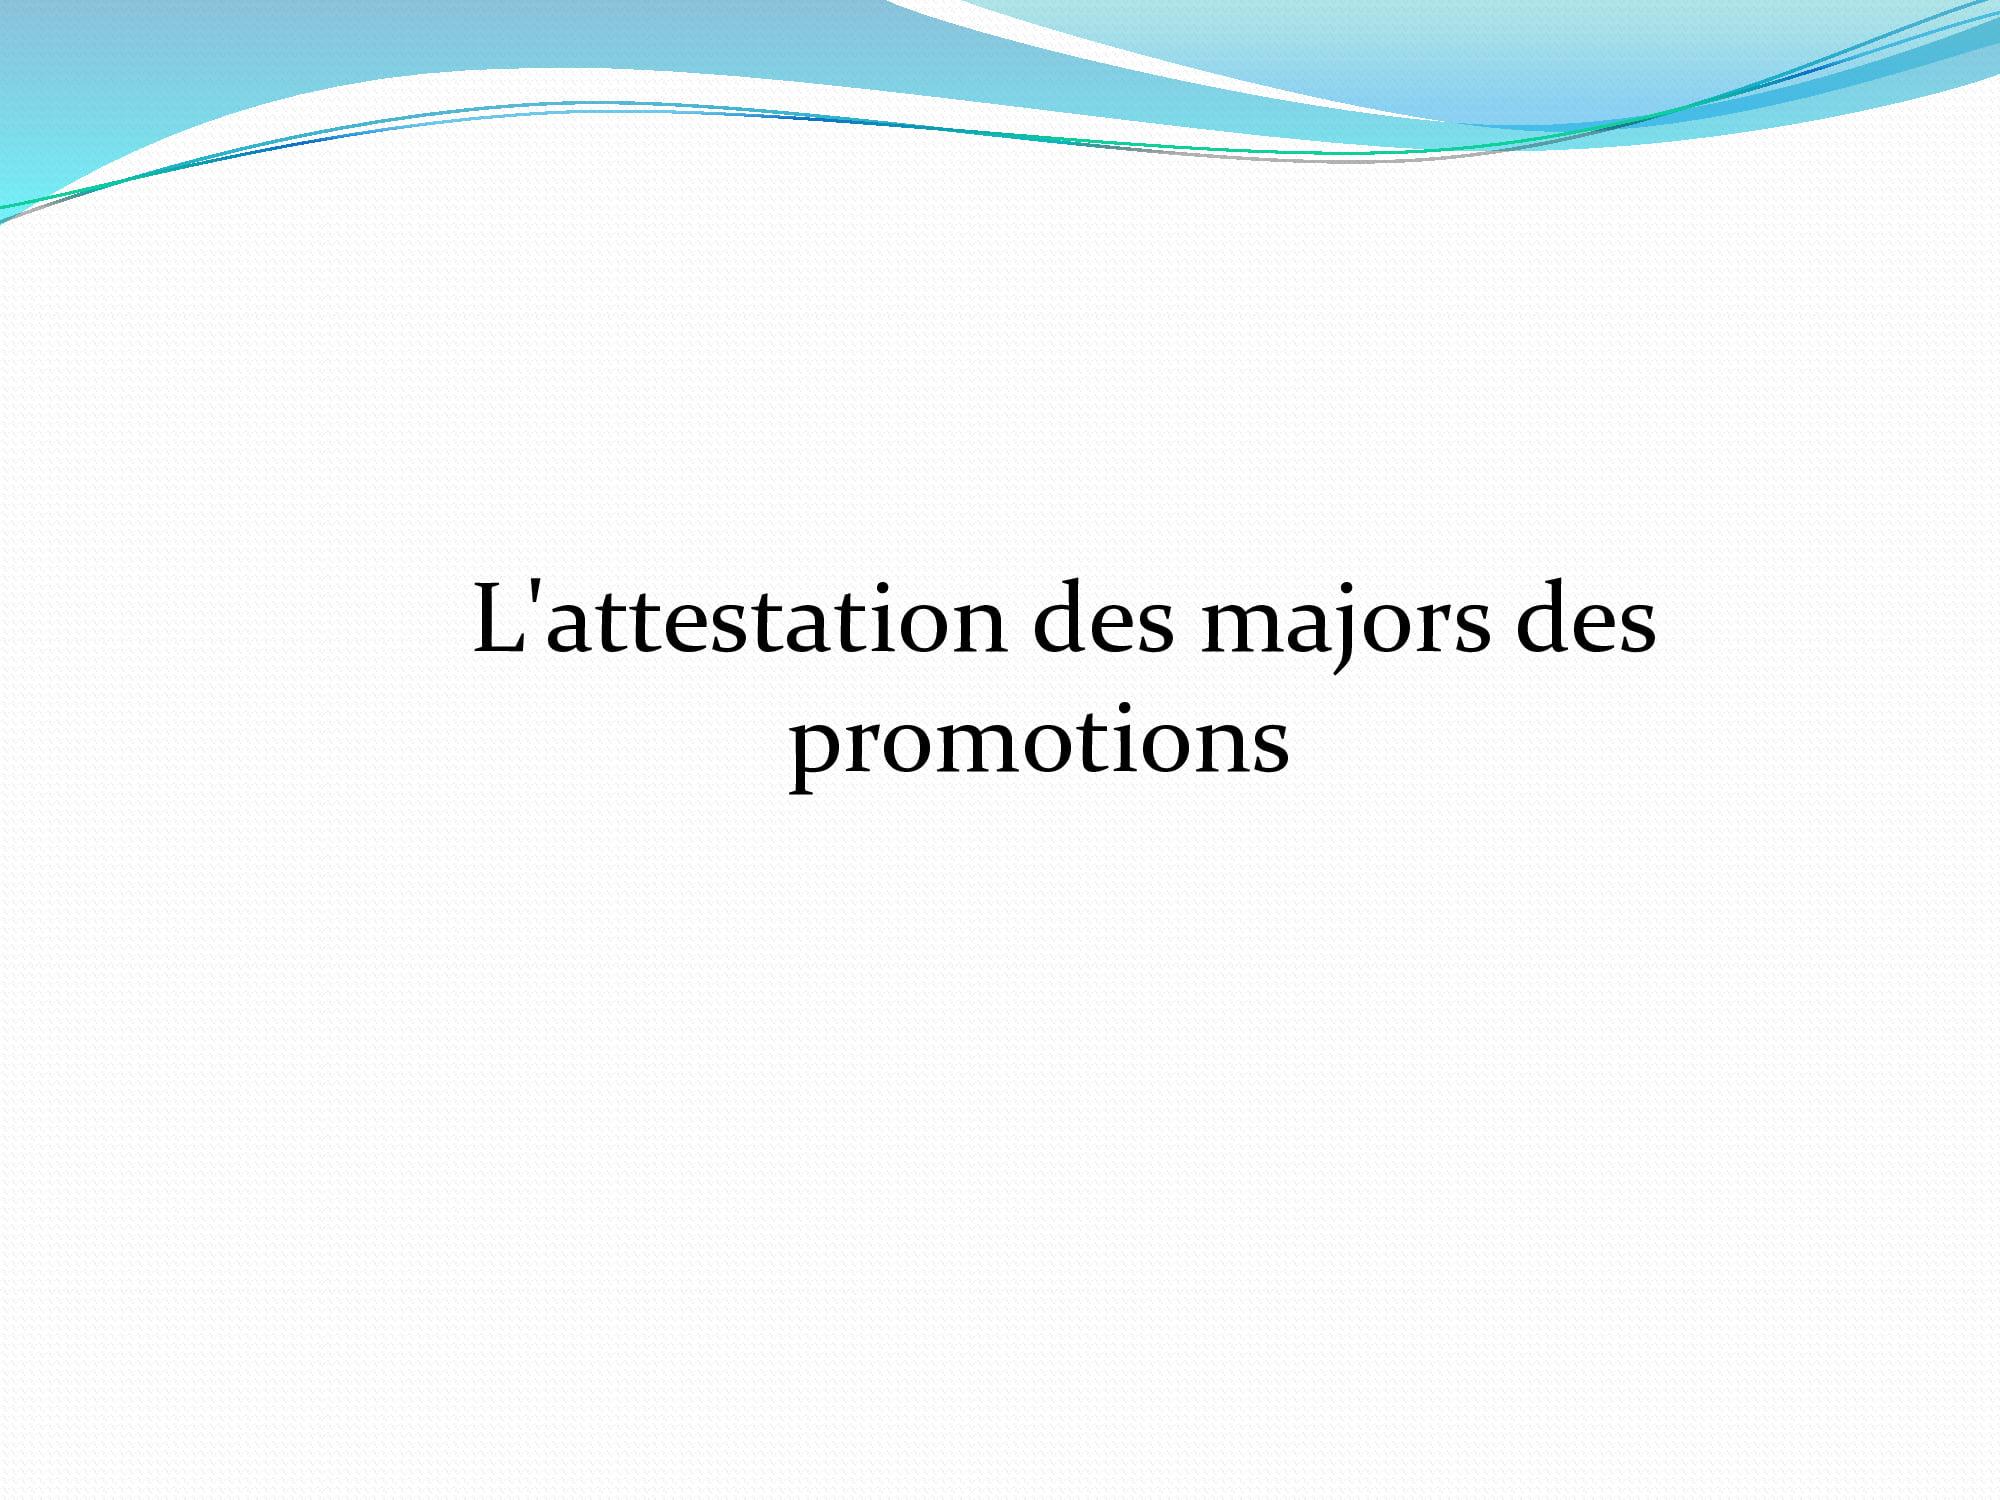 l_attestation-des-majors-des-promotions_1